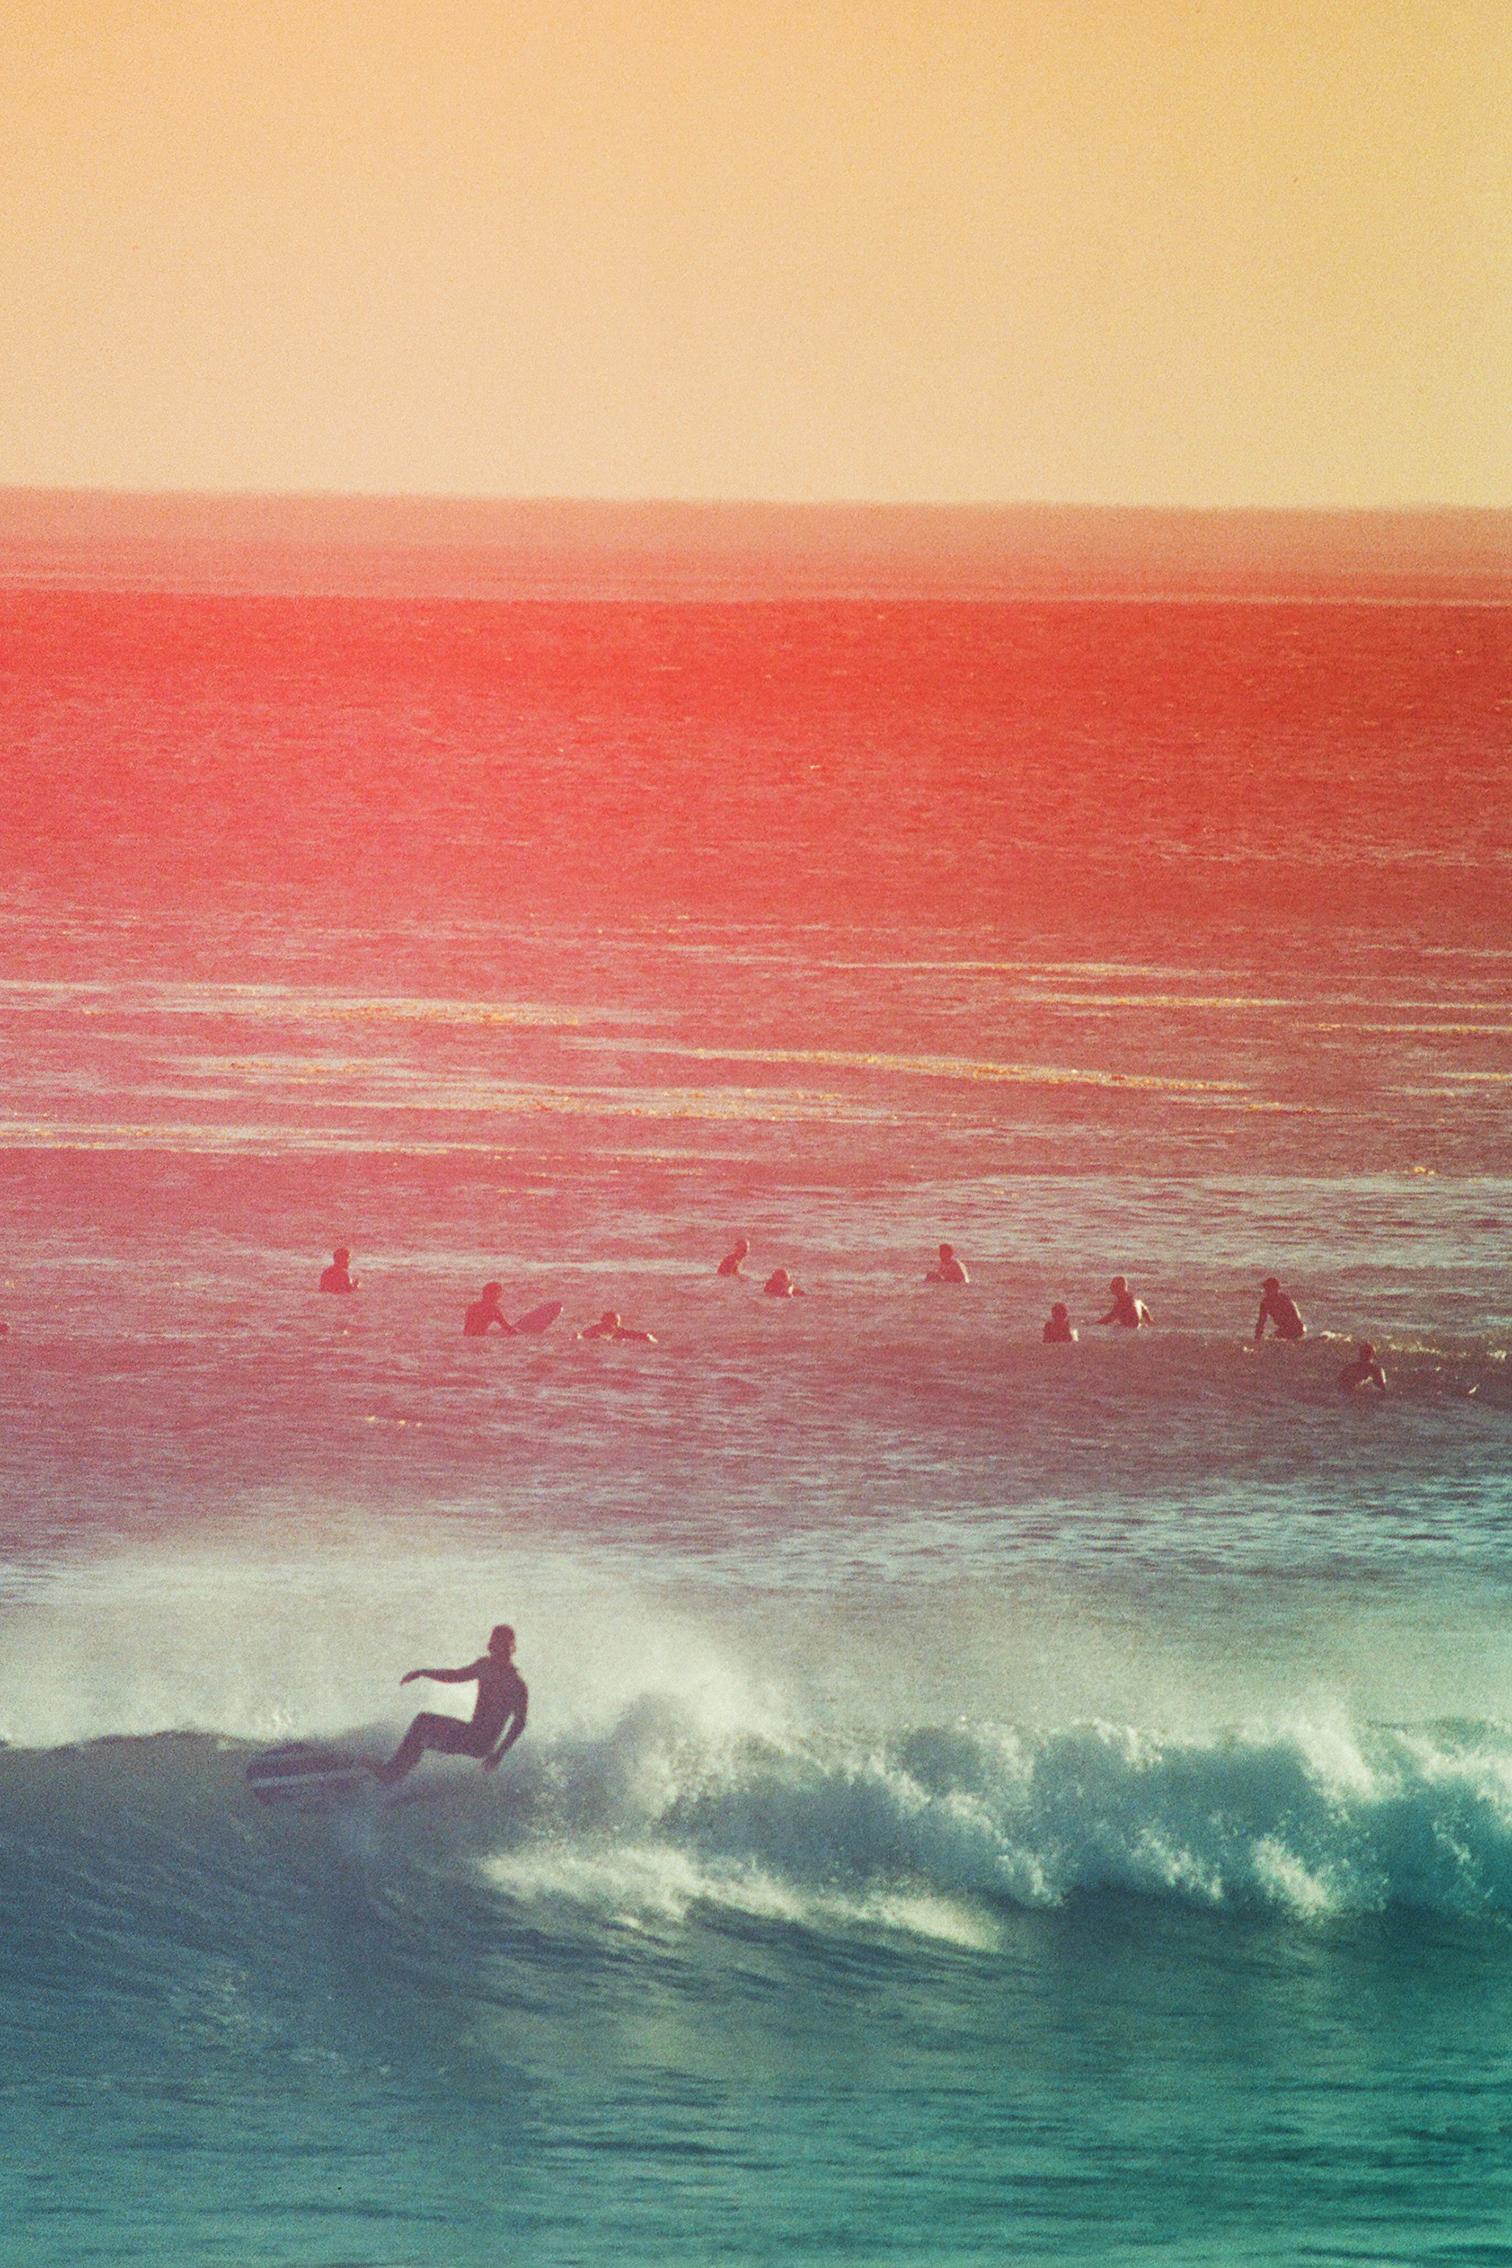 Leo single surfer  orange and red_00028.jpg